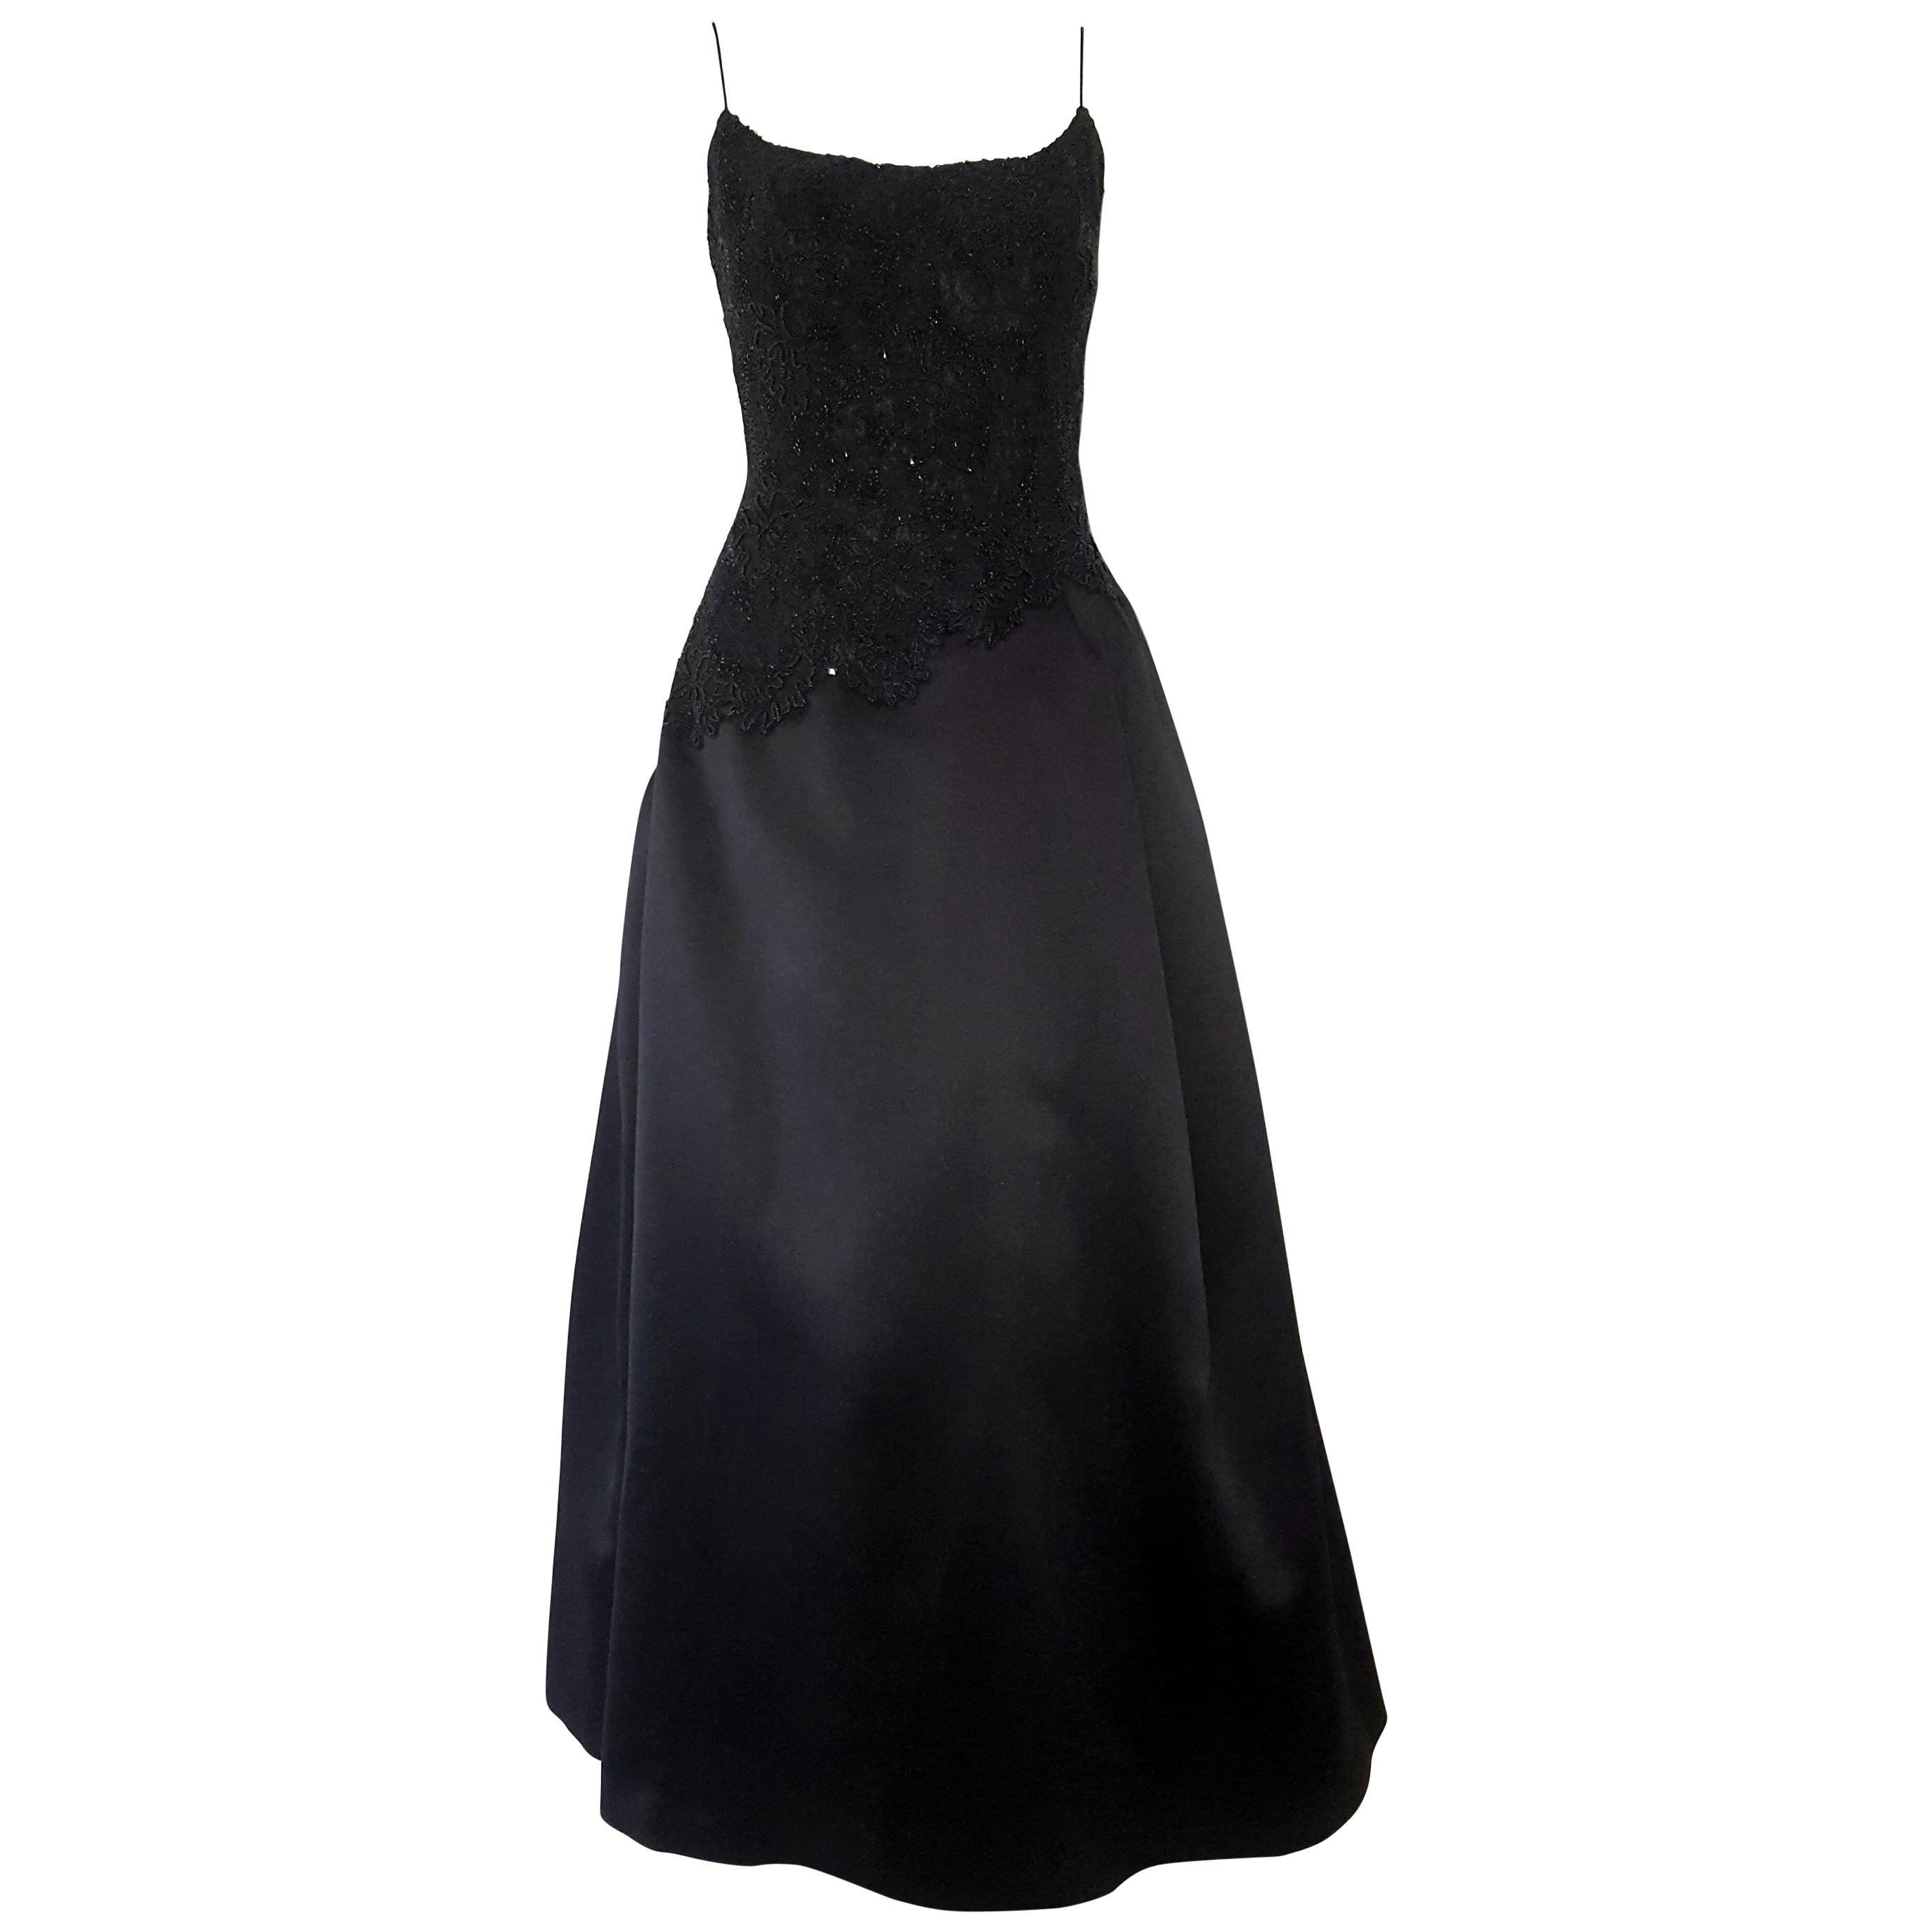 Carmen Marc Valvo Black Beaded Bodice With Black Satin Skirt